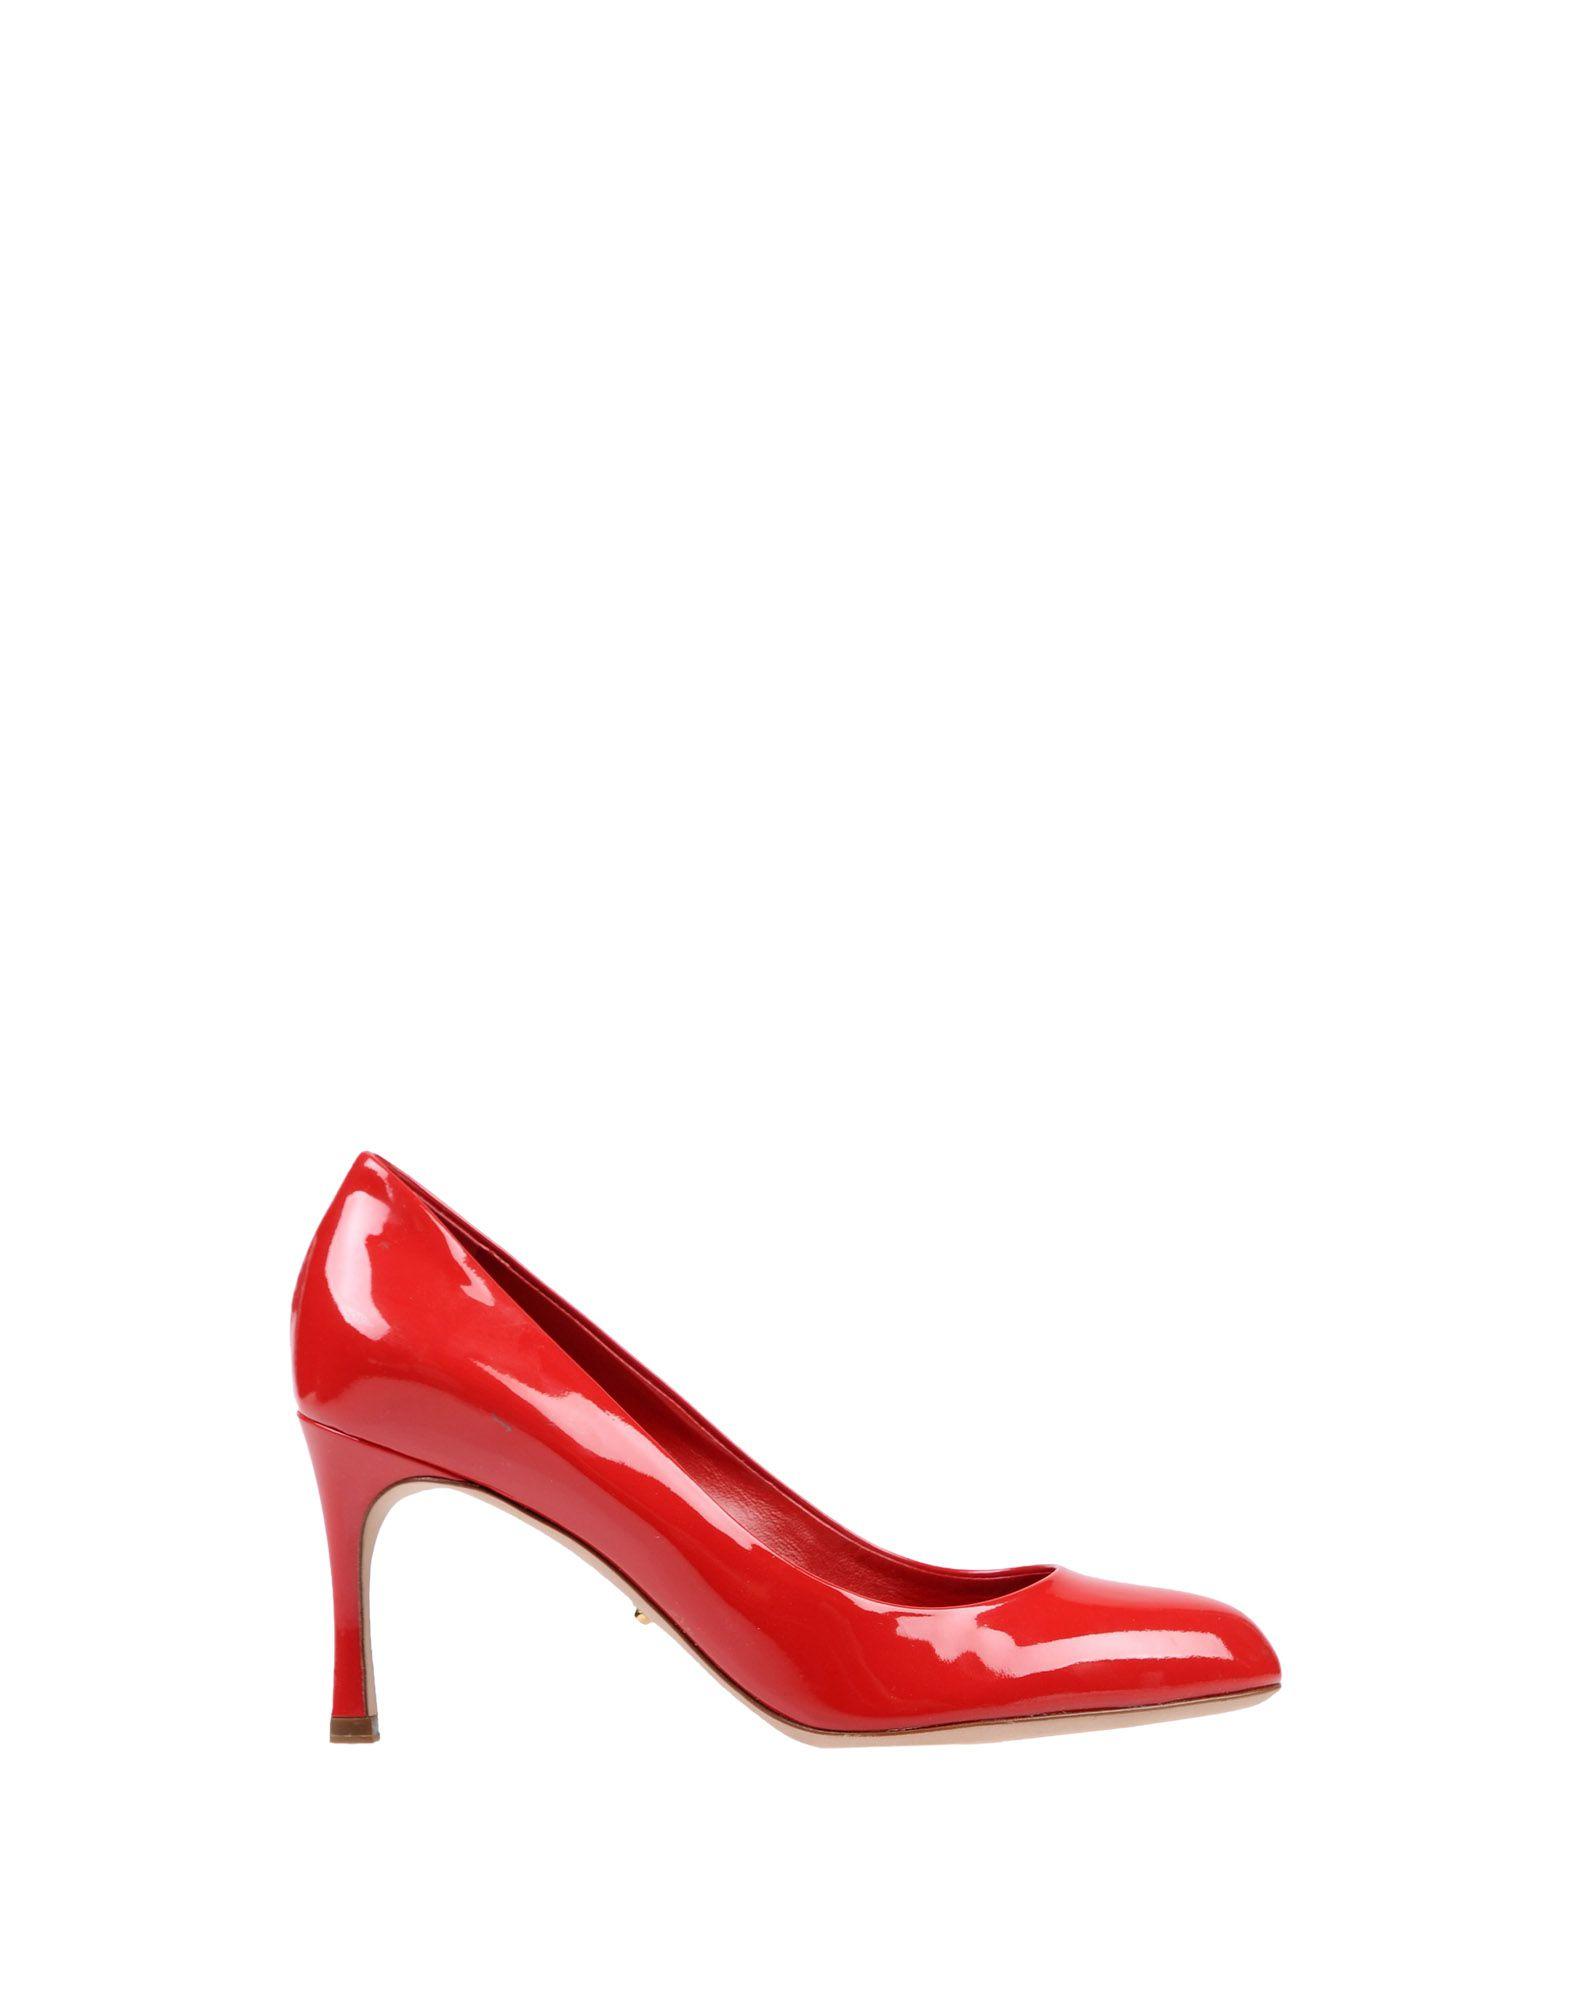 Rabatt Schuhe Sergio Rossi Pumps Damen  11284809EQ 11284809EQ 11284809EQ b14d95